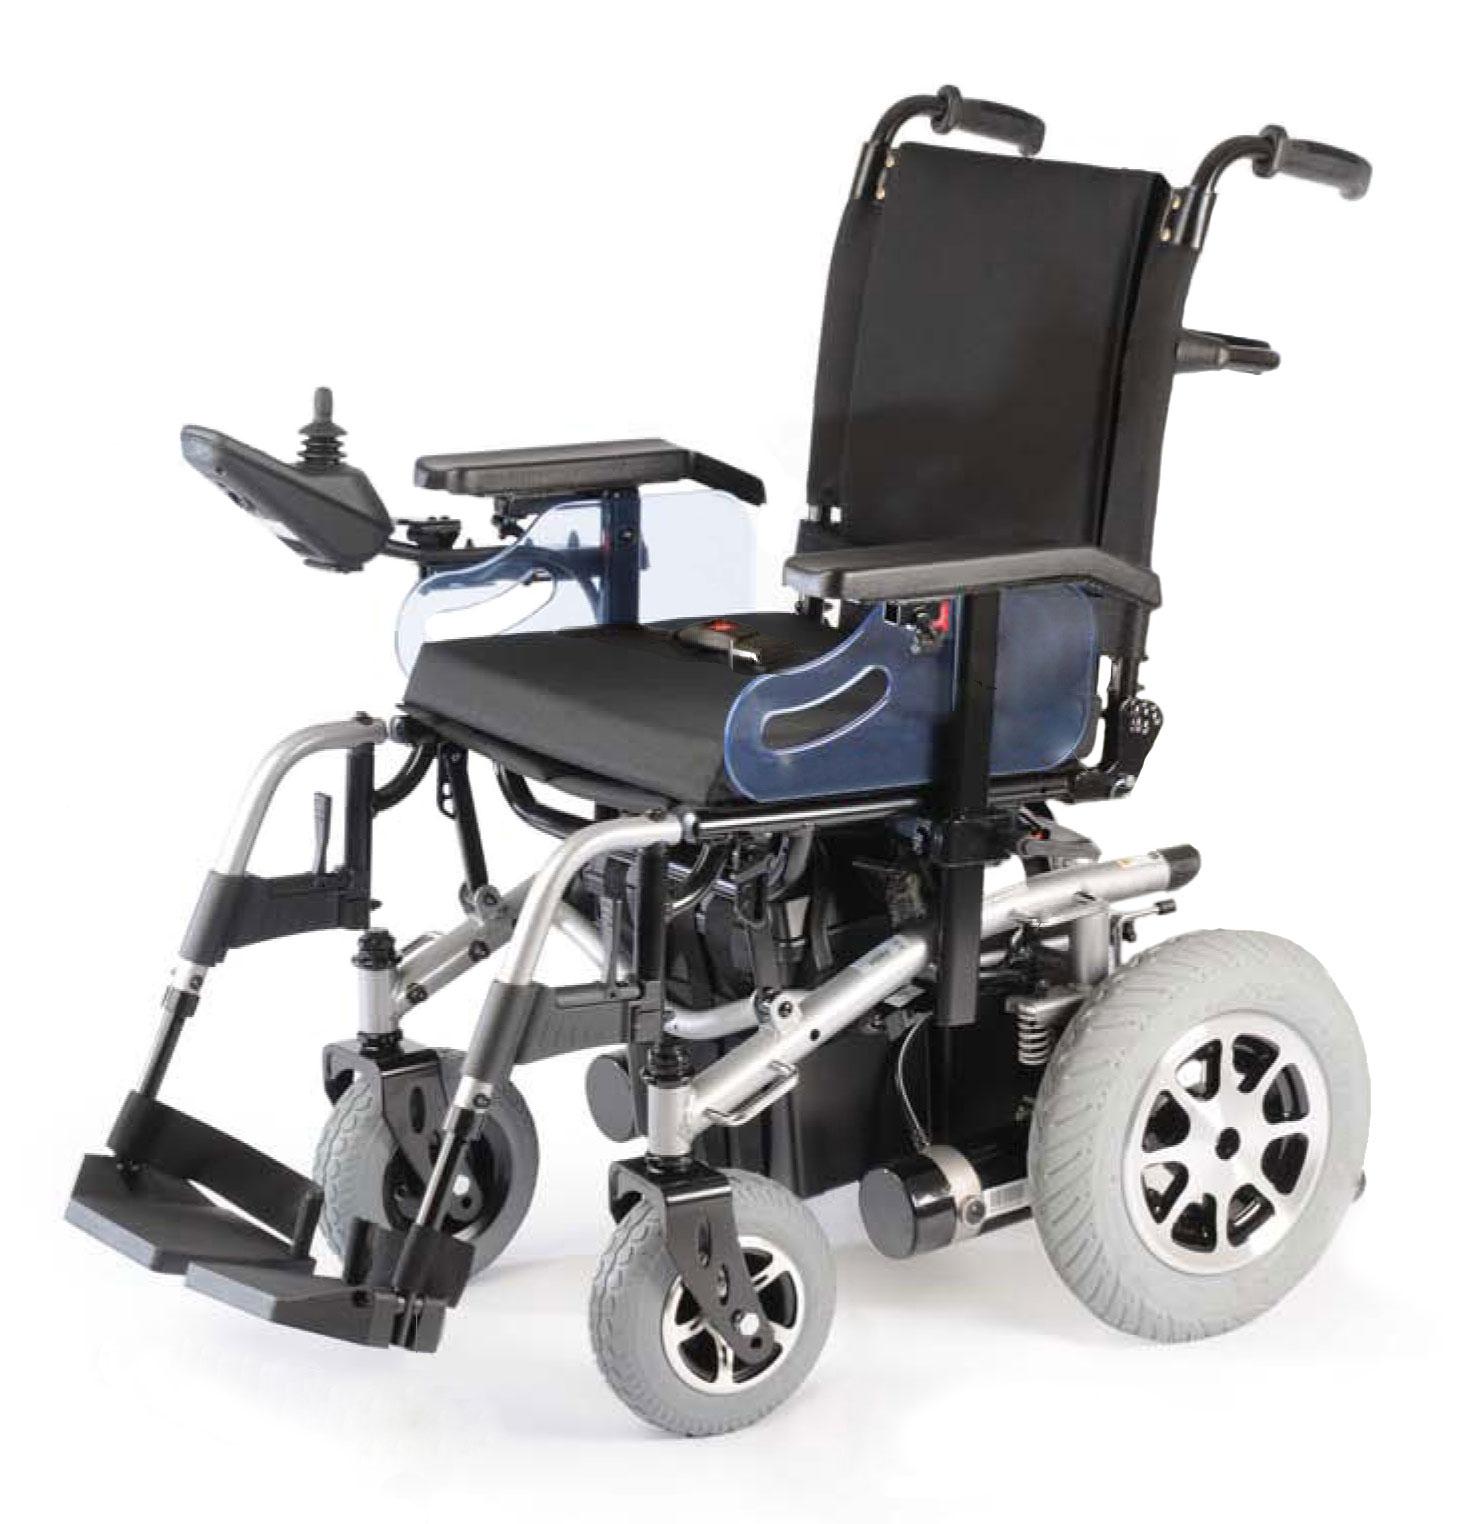 Silla de ruedas lectrica para exterior - Sillas de ruedas electricas ...